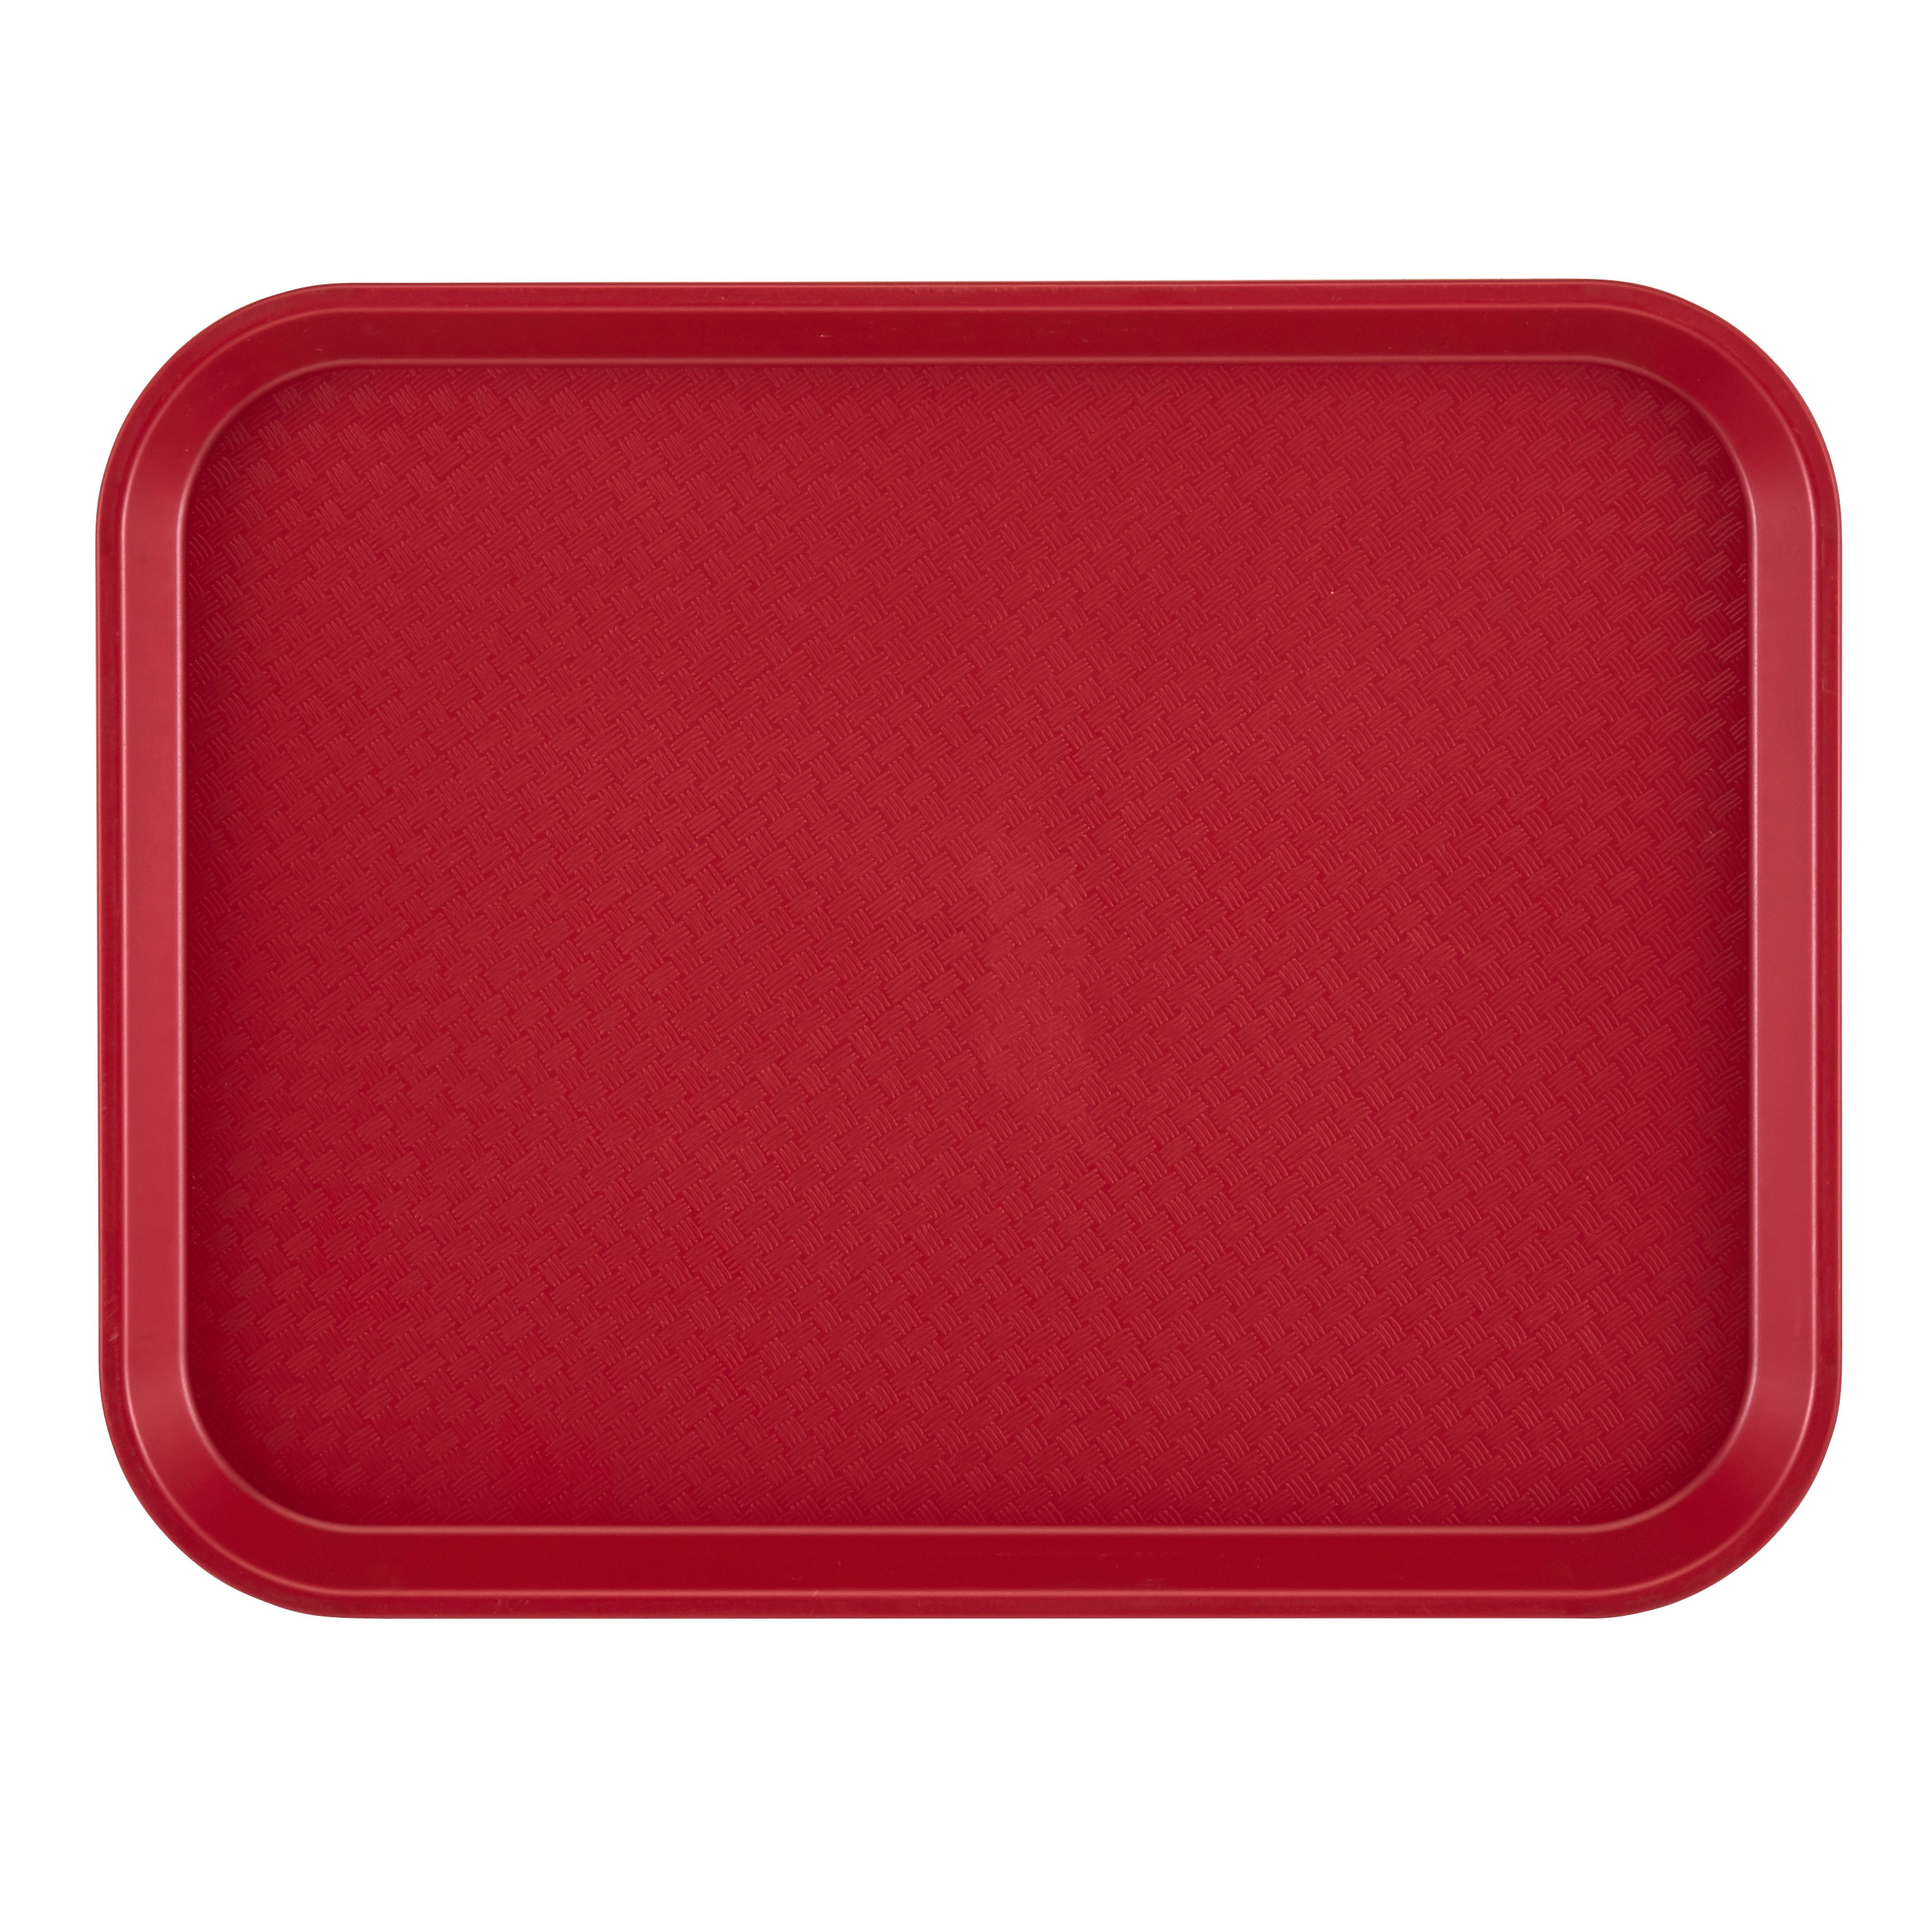 Cambro 1418FF416 tray, fast food